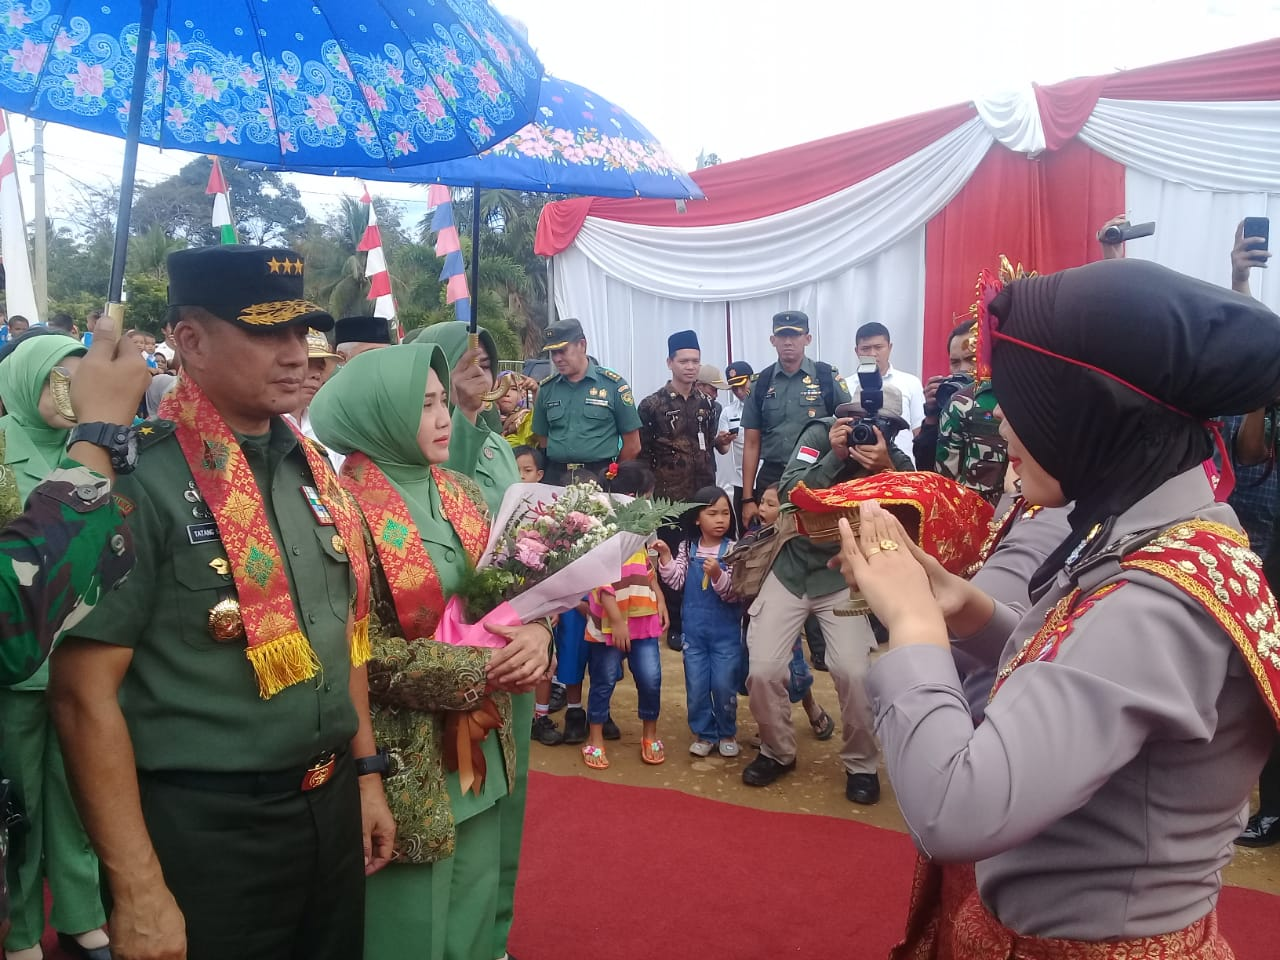 Drama Perjuangan Pahlawan Ratu Samban Warnai Penutupan TMMD Reguler di Bengkulu Utara